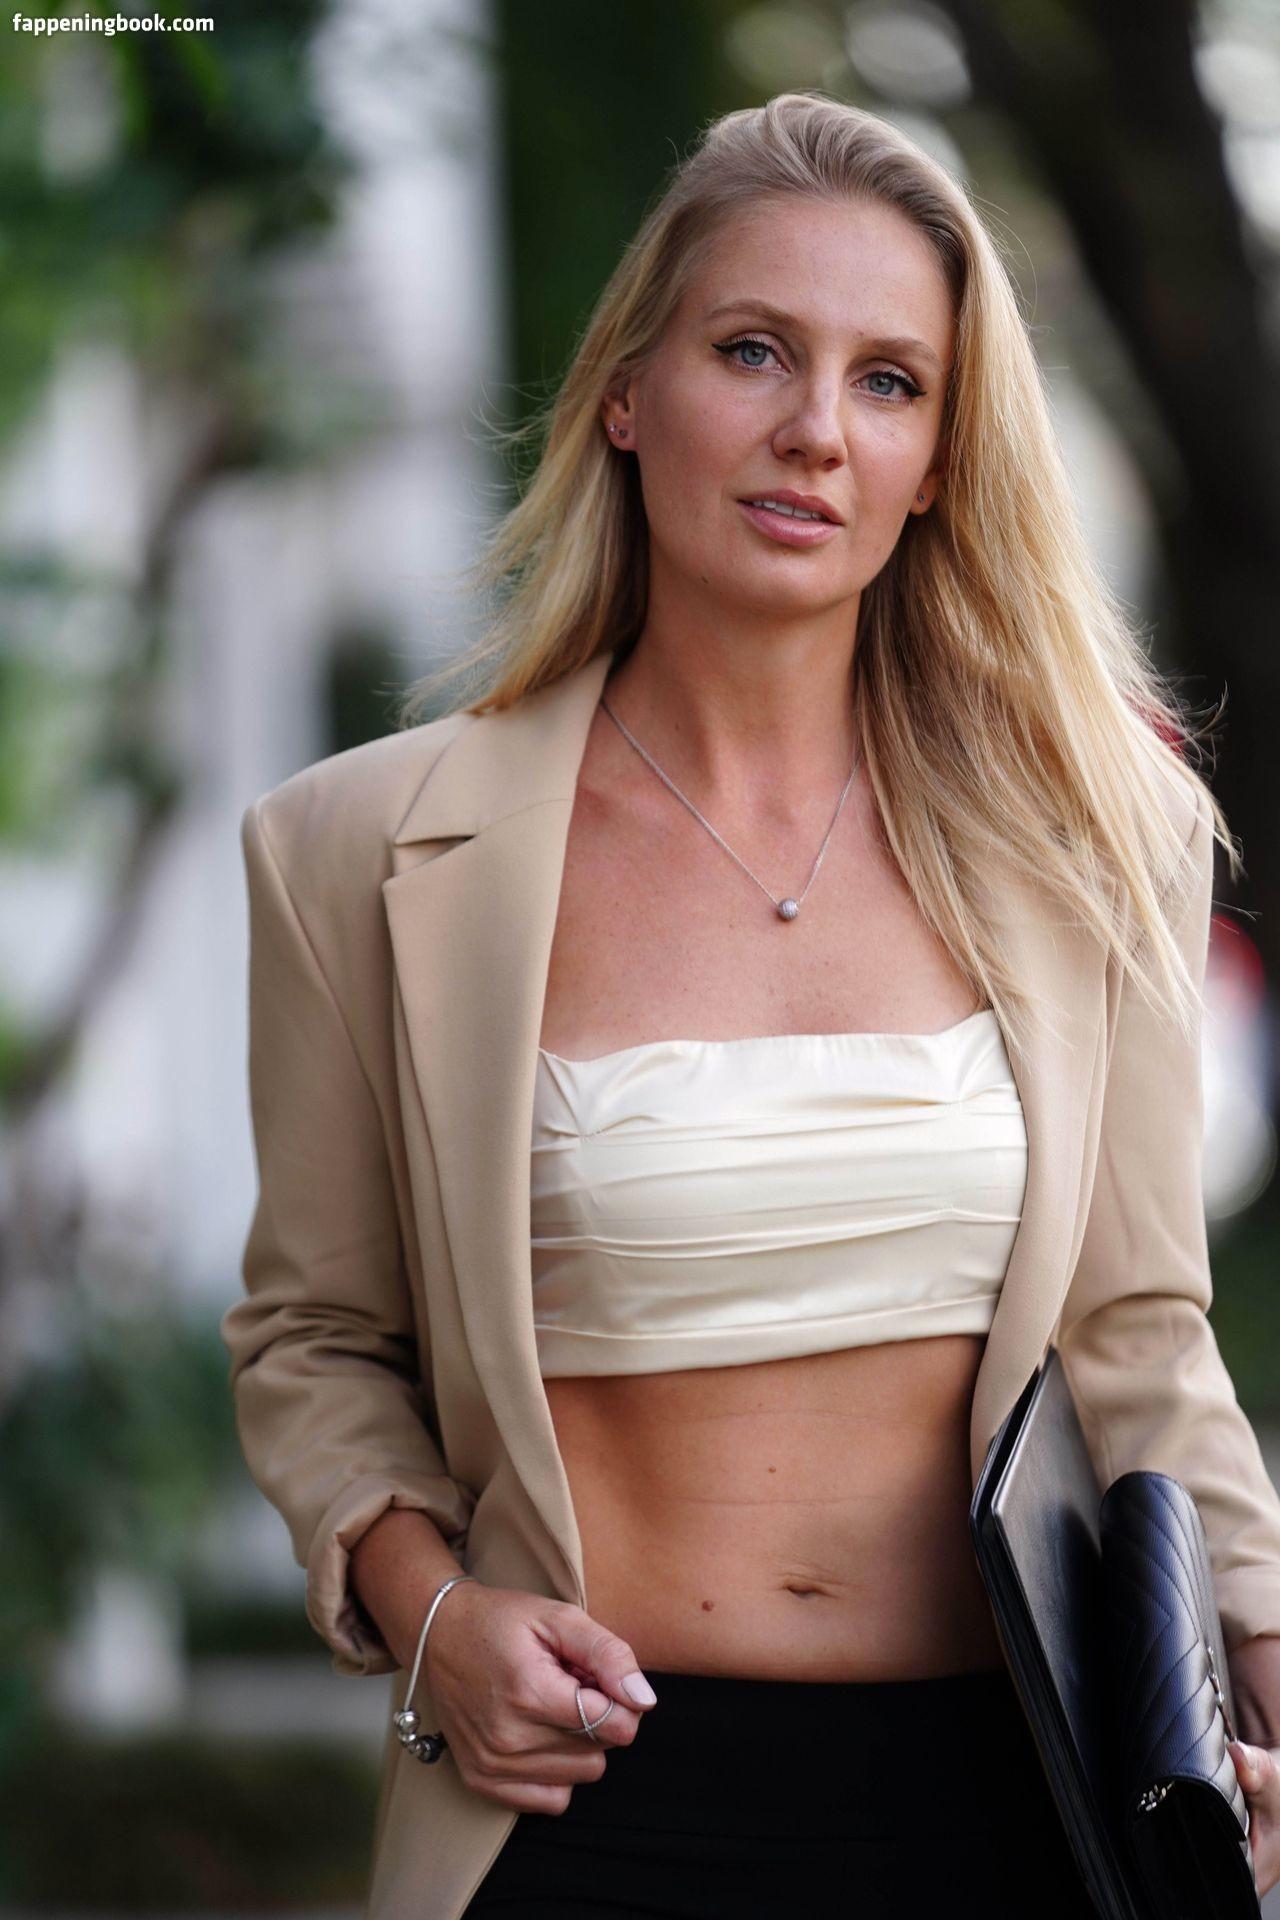 Anya Shevchenko Nude